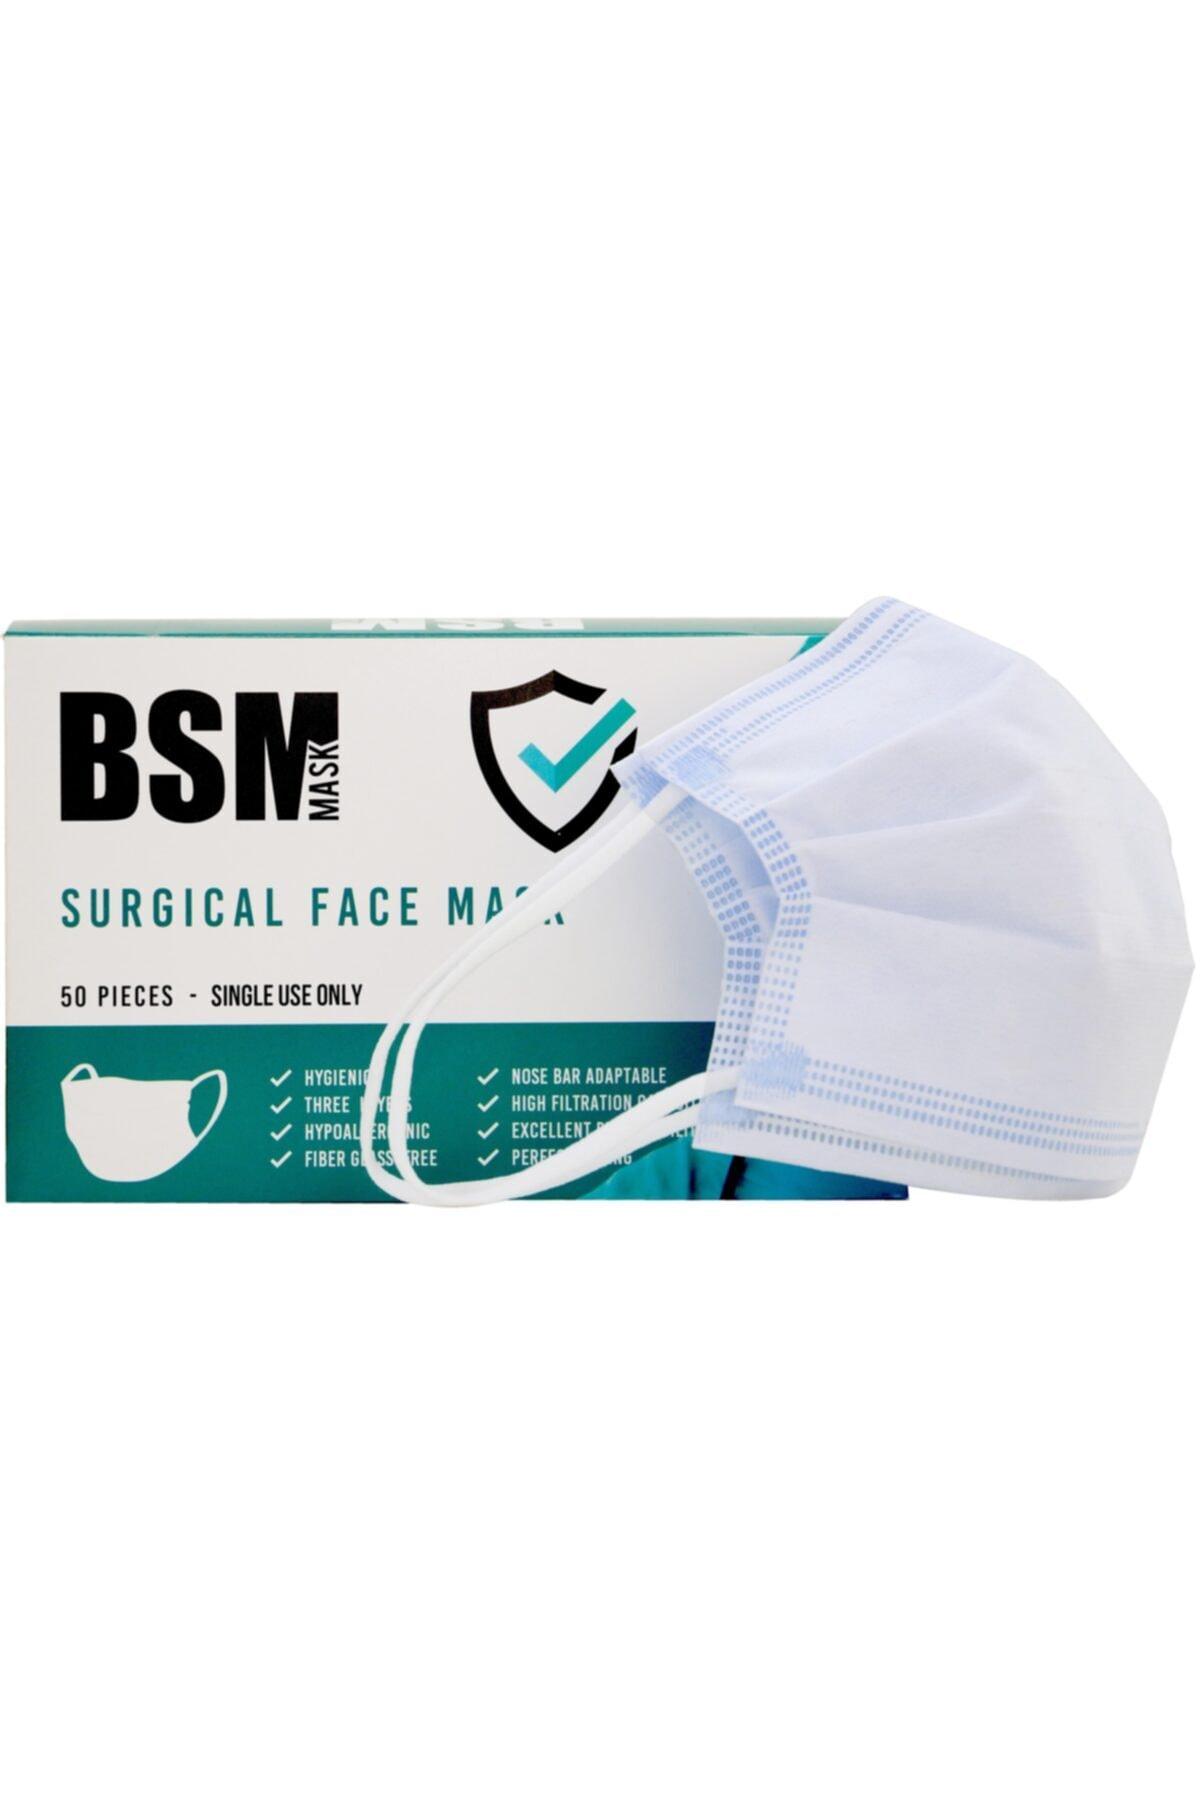 Mavi 3 Katlı Yassı Lastikli Meltblown Cerrahi Maske Toplam 50 Adet